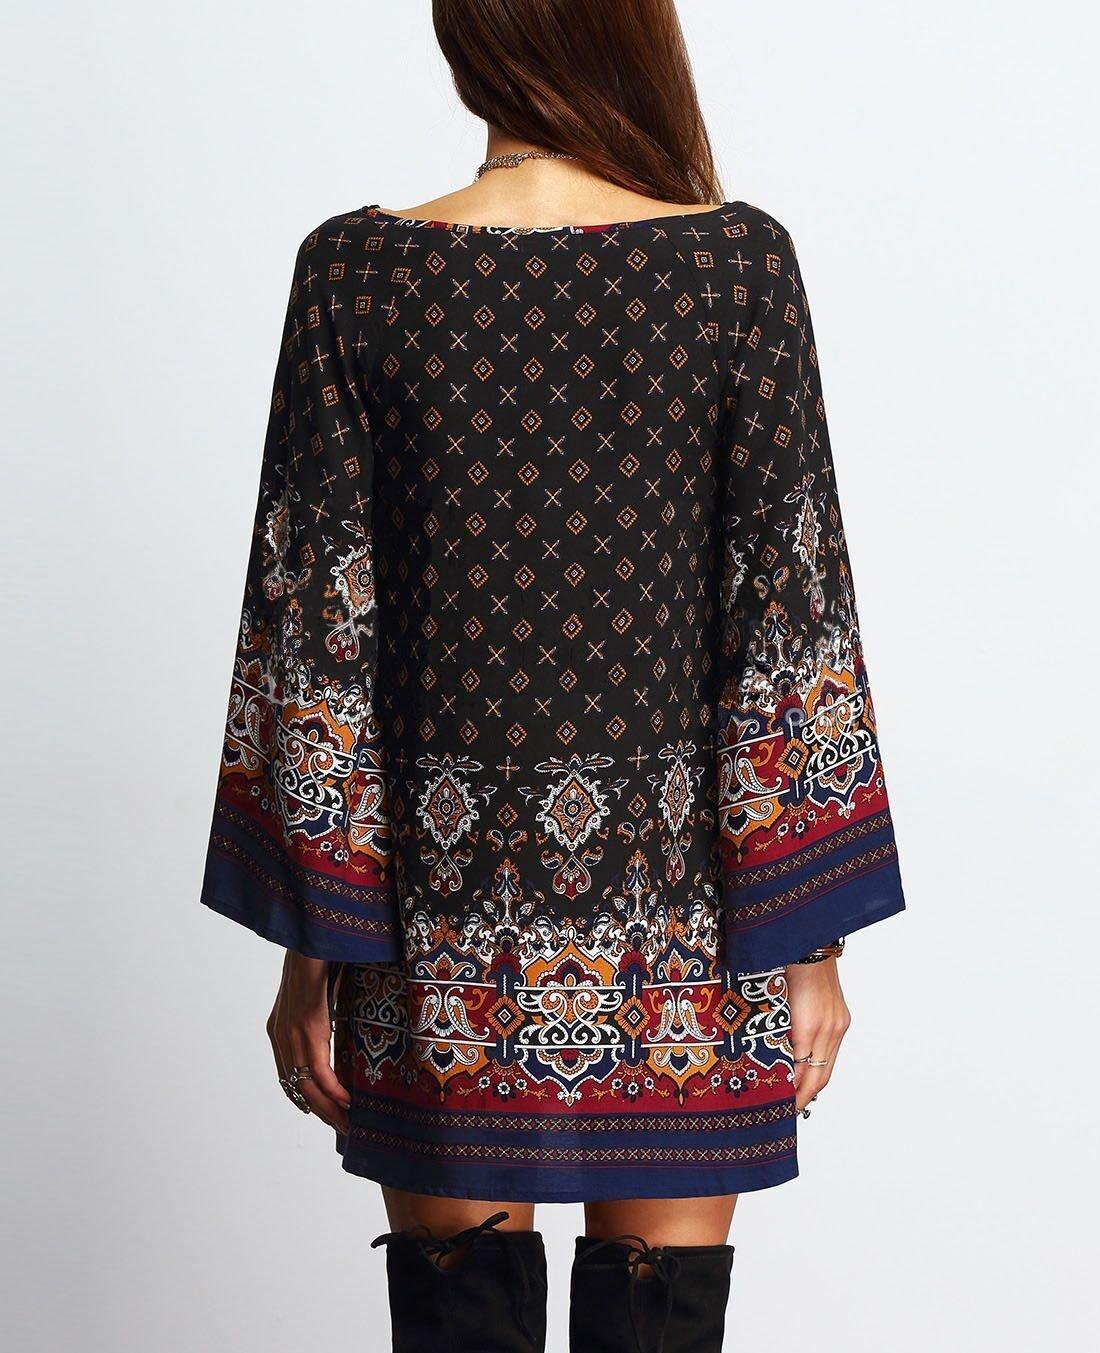 Long-Sleeved Loose Fit Boho Casual Dress